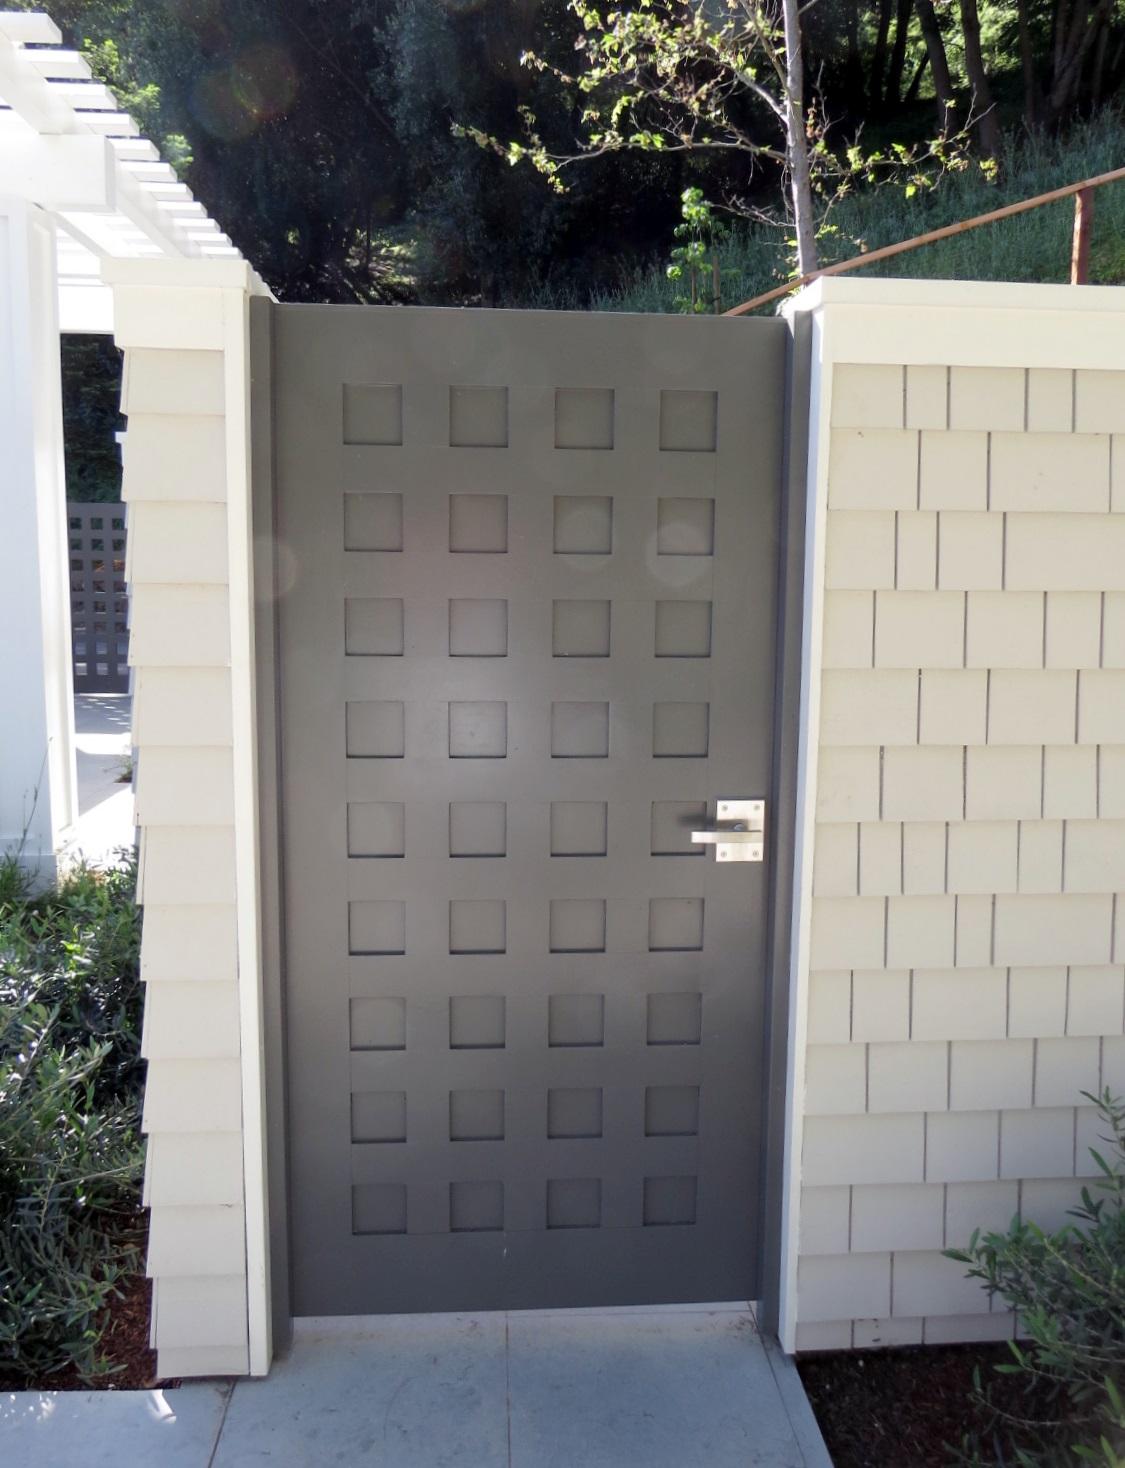 pool-dressing-door-latch-stainless-steel-alta-lever-latch-by-360-yardware.jpg